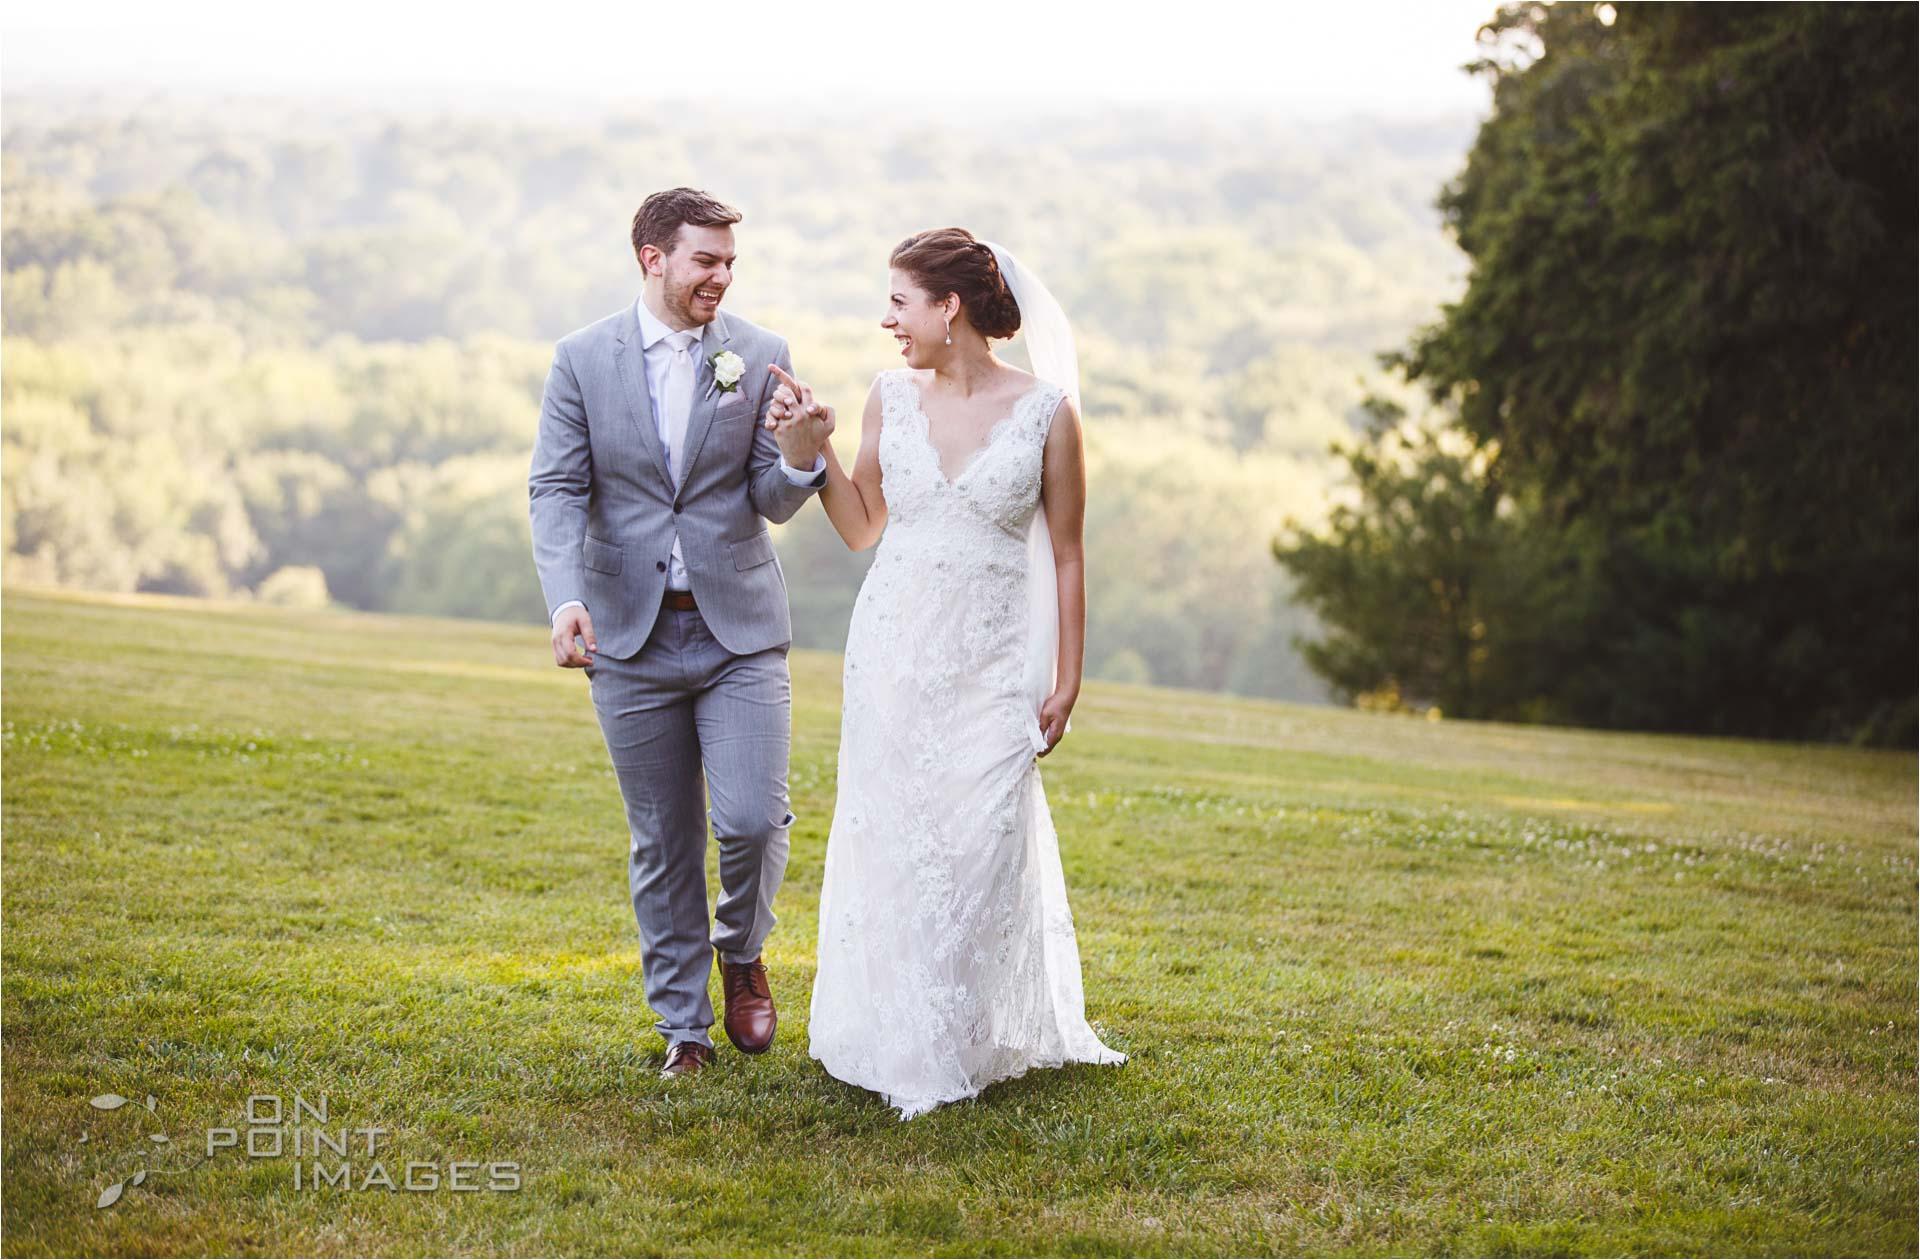 wickham-park-wedding-photographer-ct-27.jpg